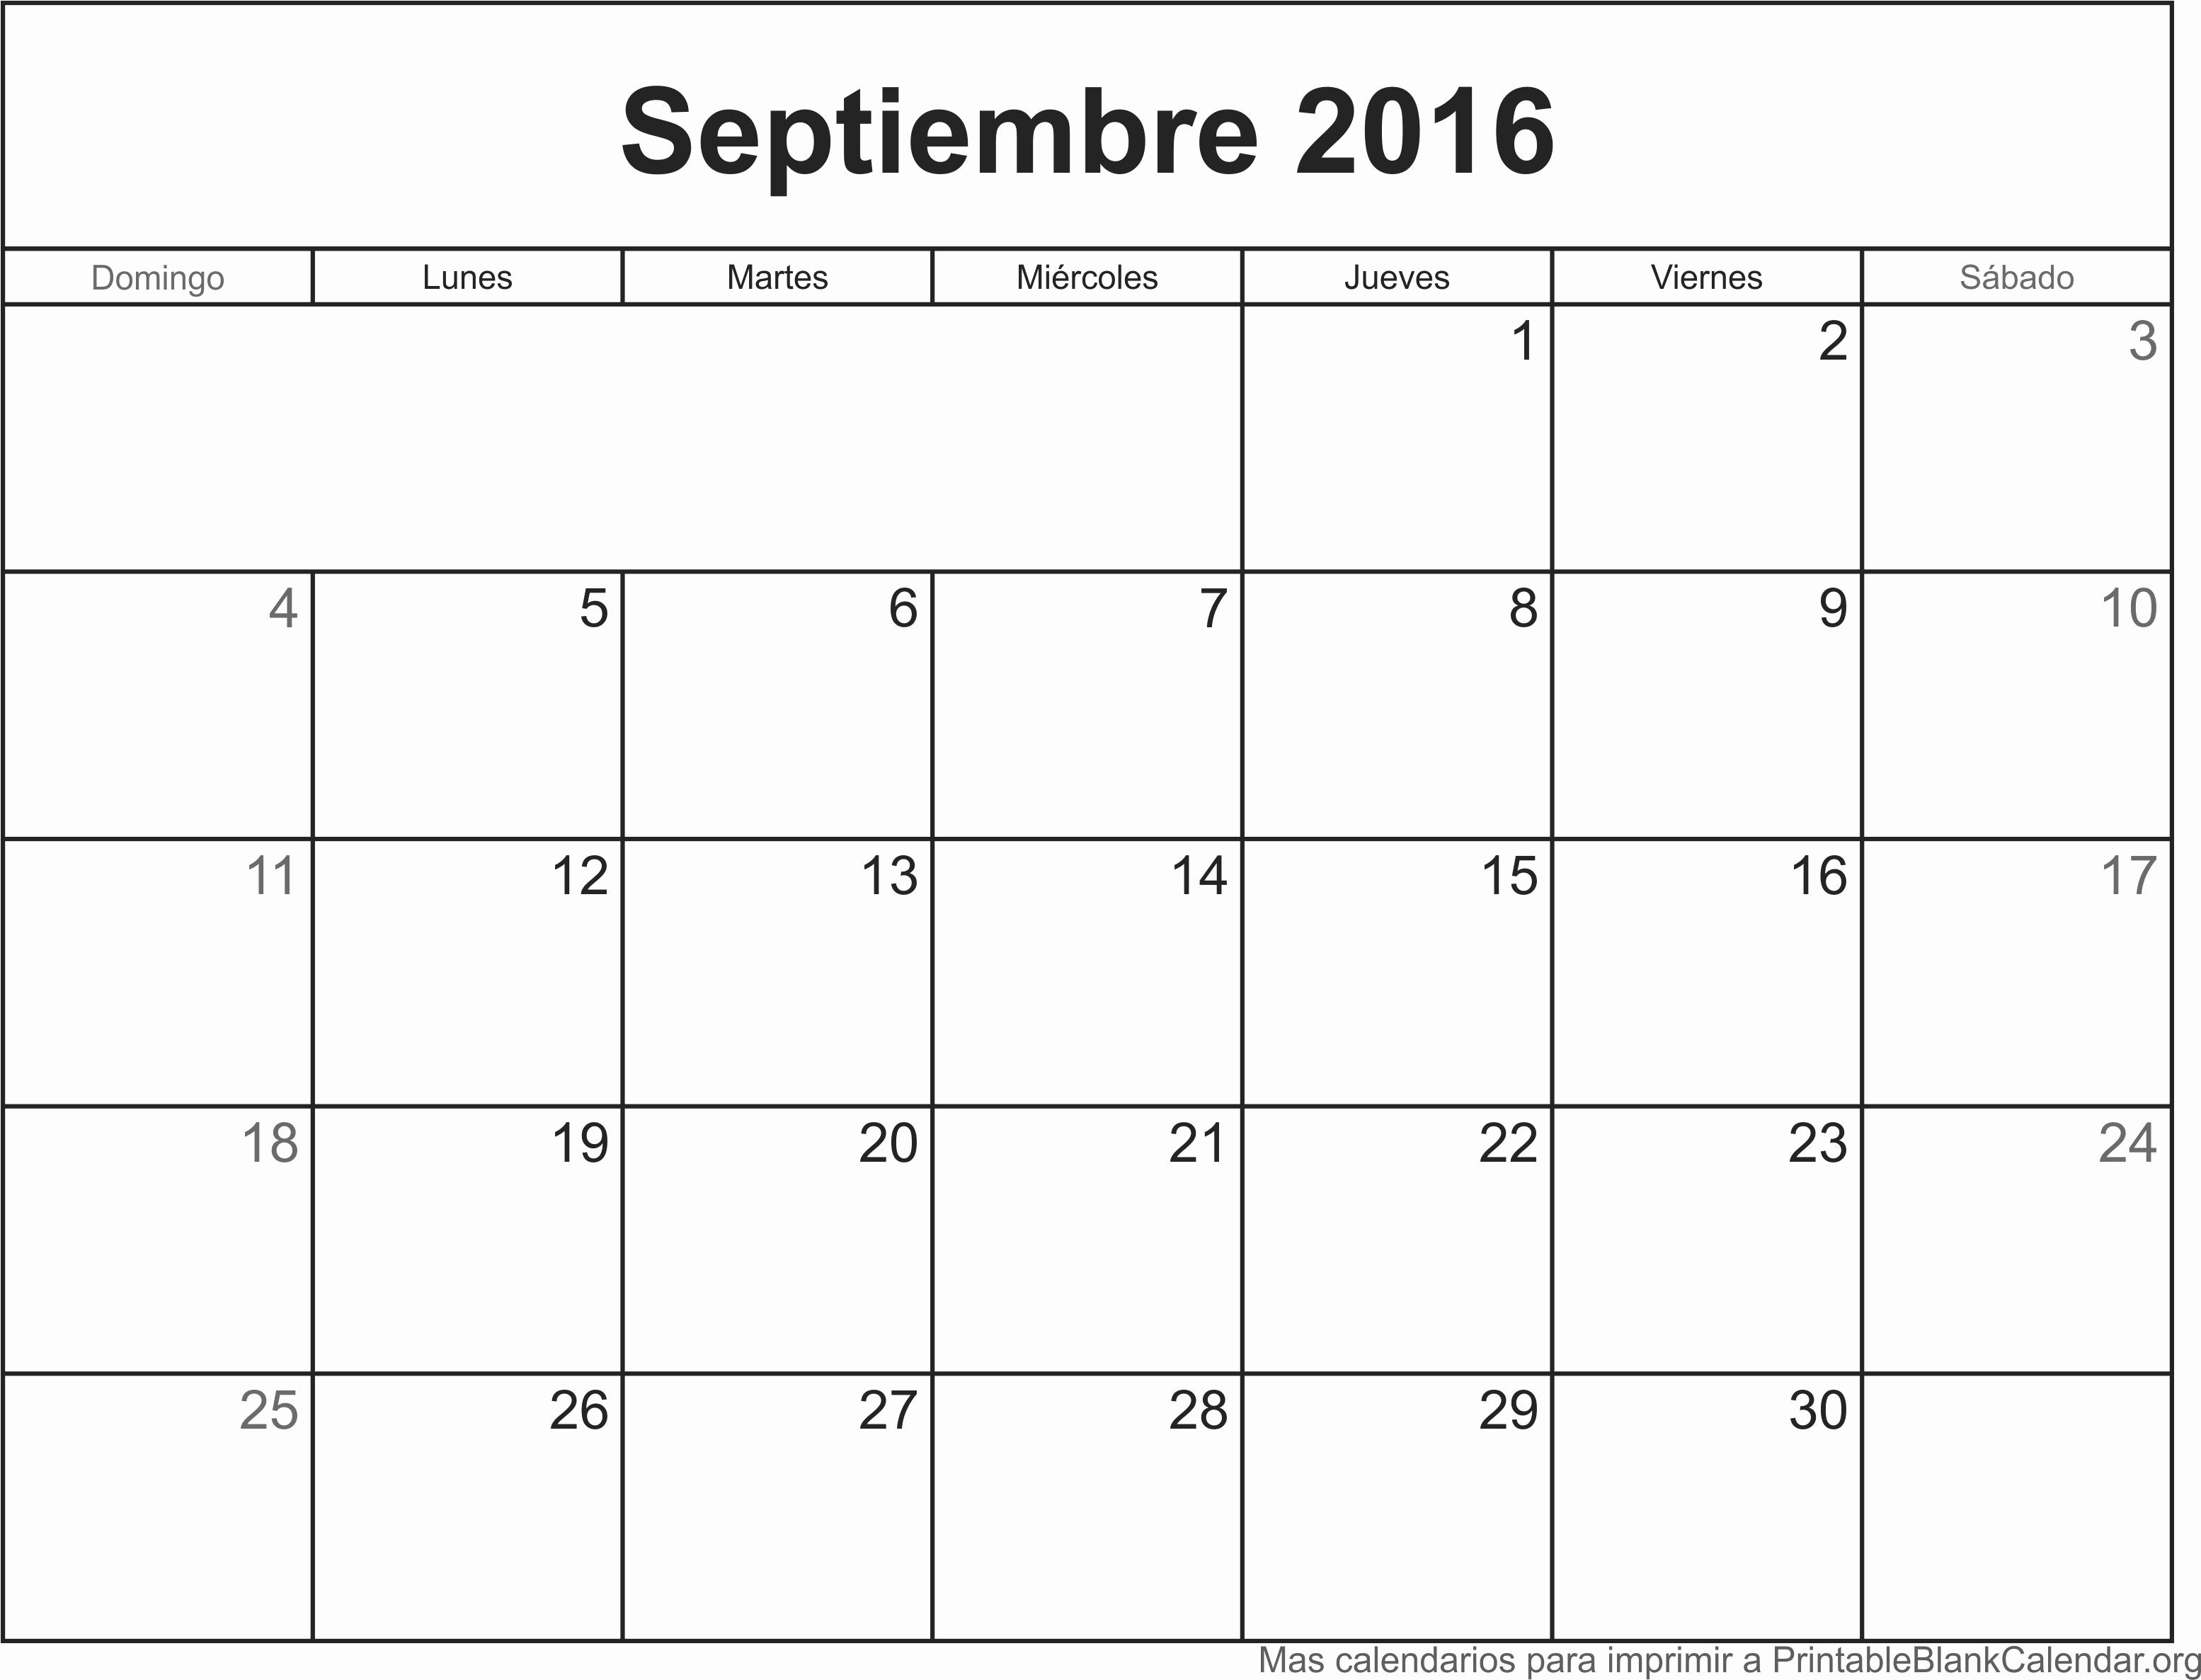 Calendario Diciembre 2017 Para Imprimir Best Of Abril 2016 Calendario Calendarios Para Imprimir